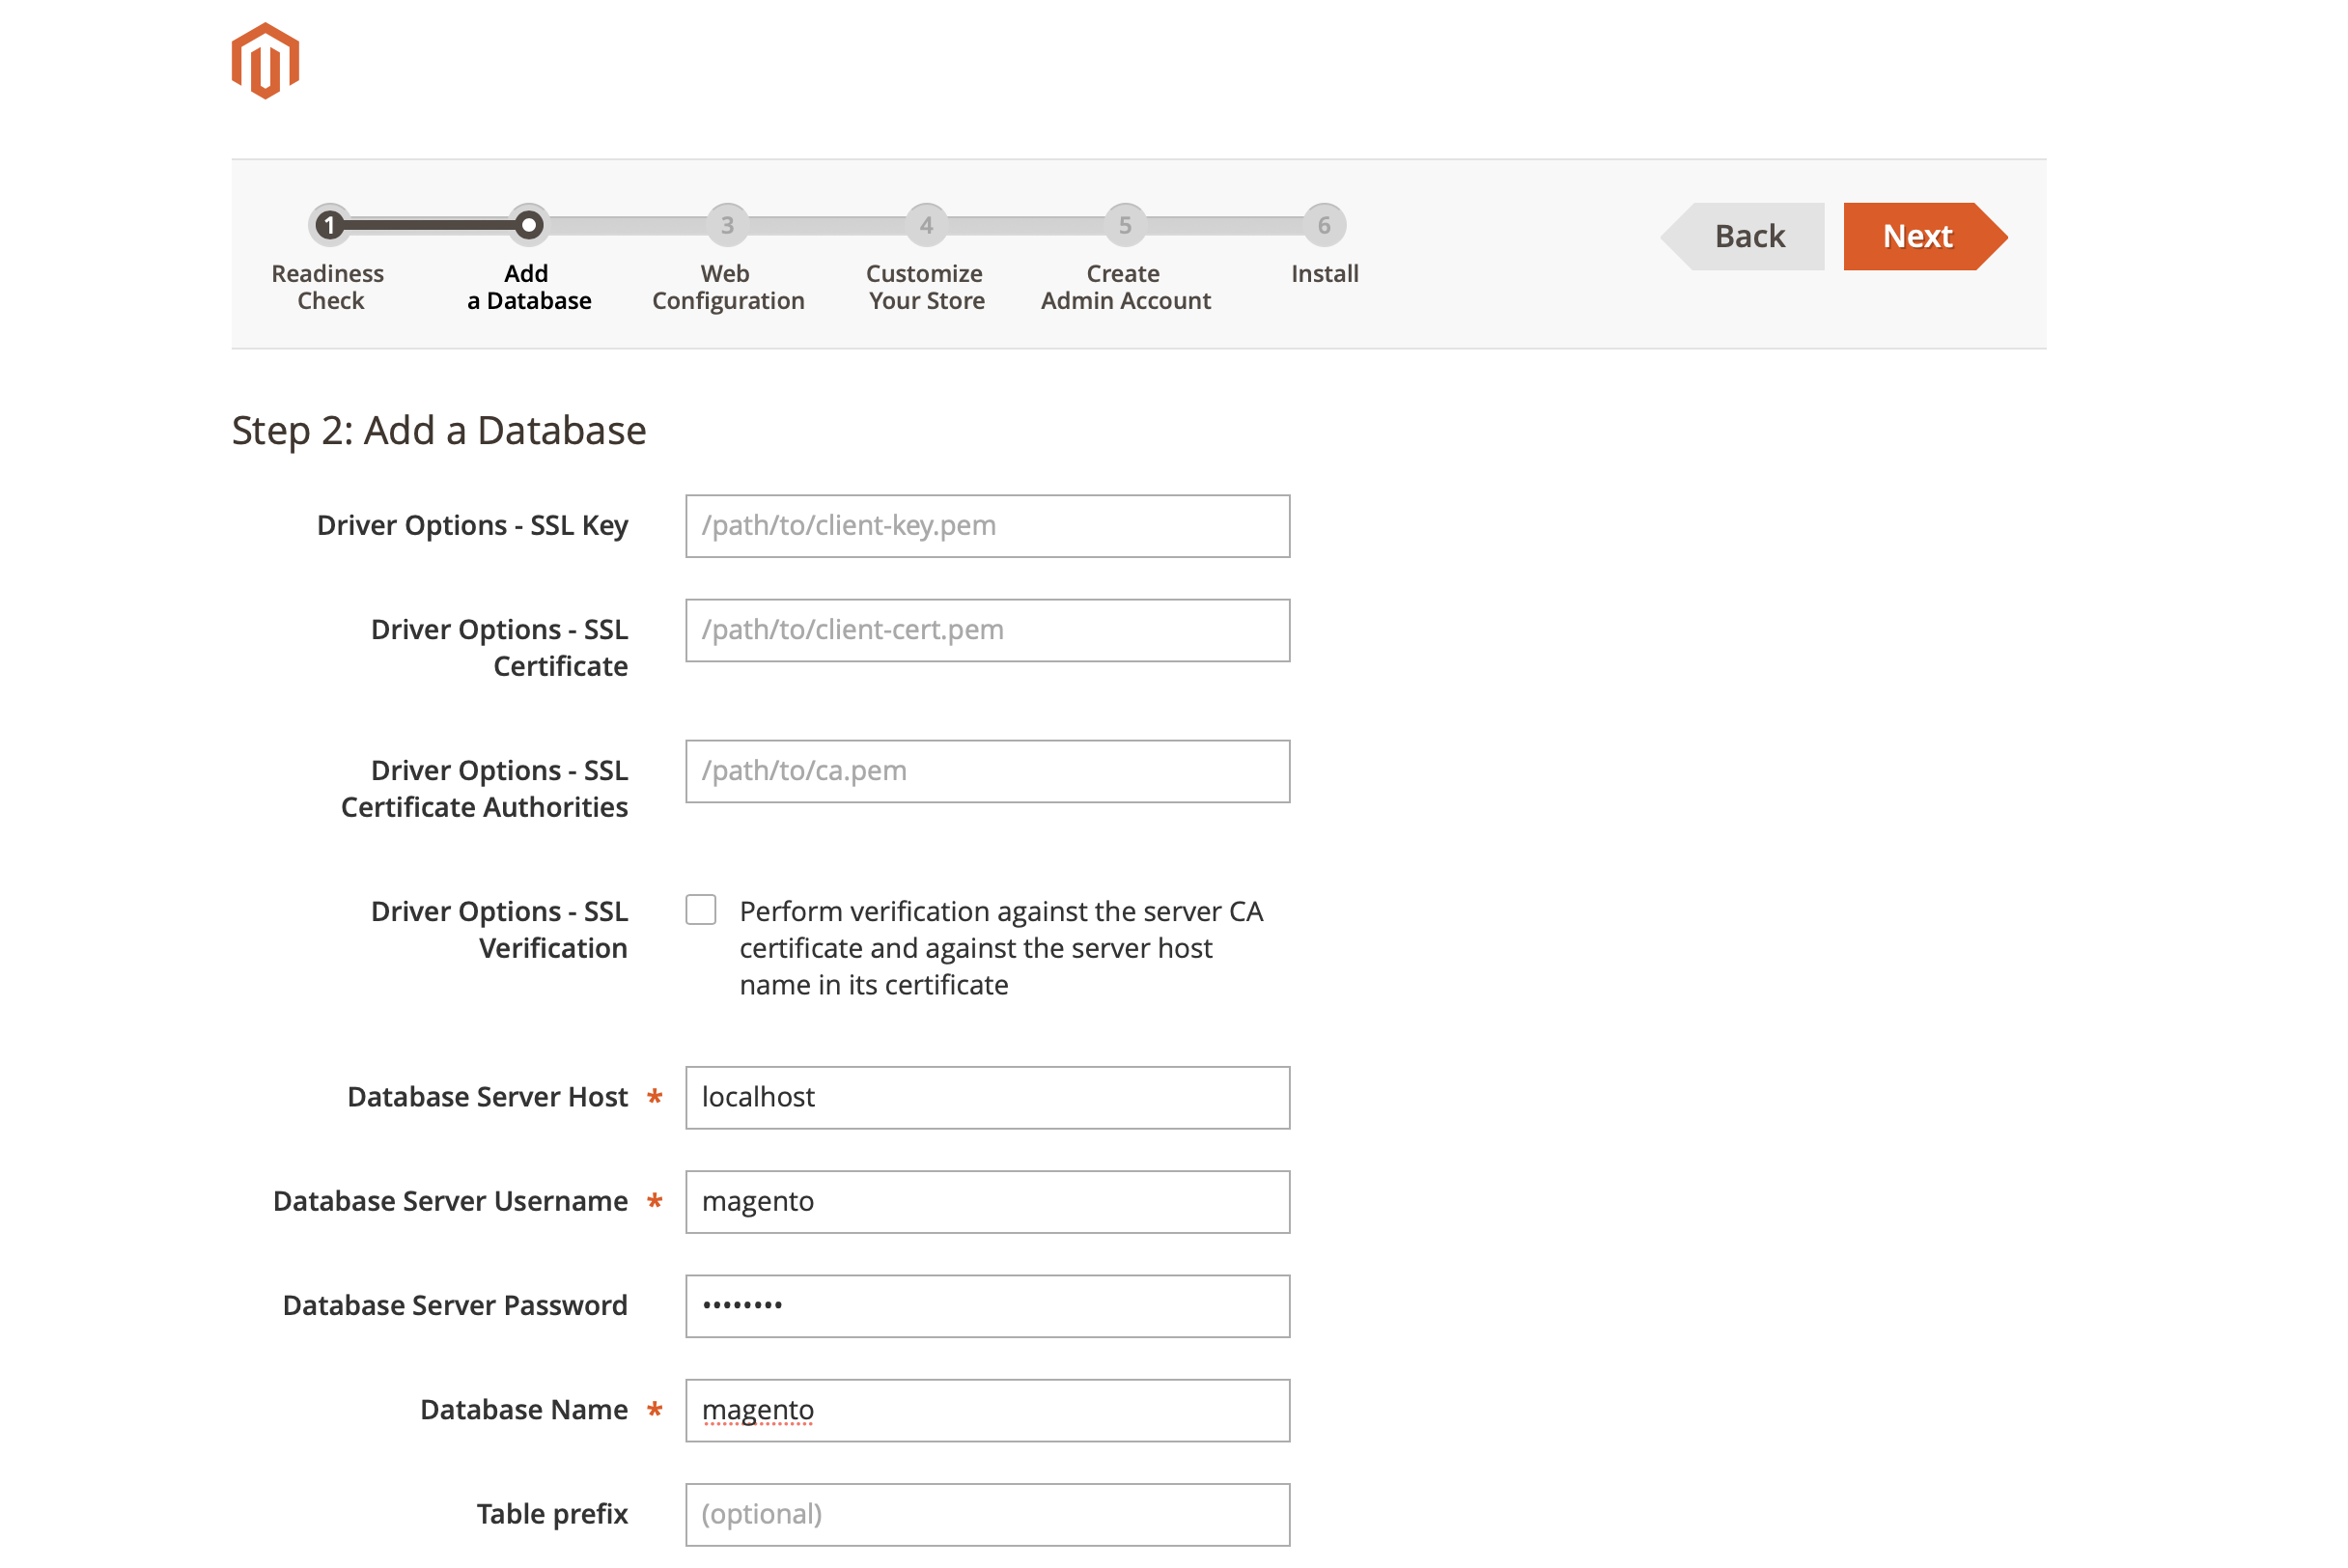 Magento Installation Wizard - Add Database